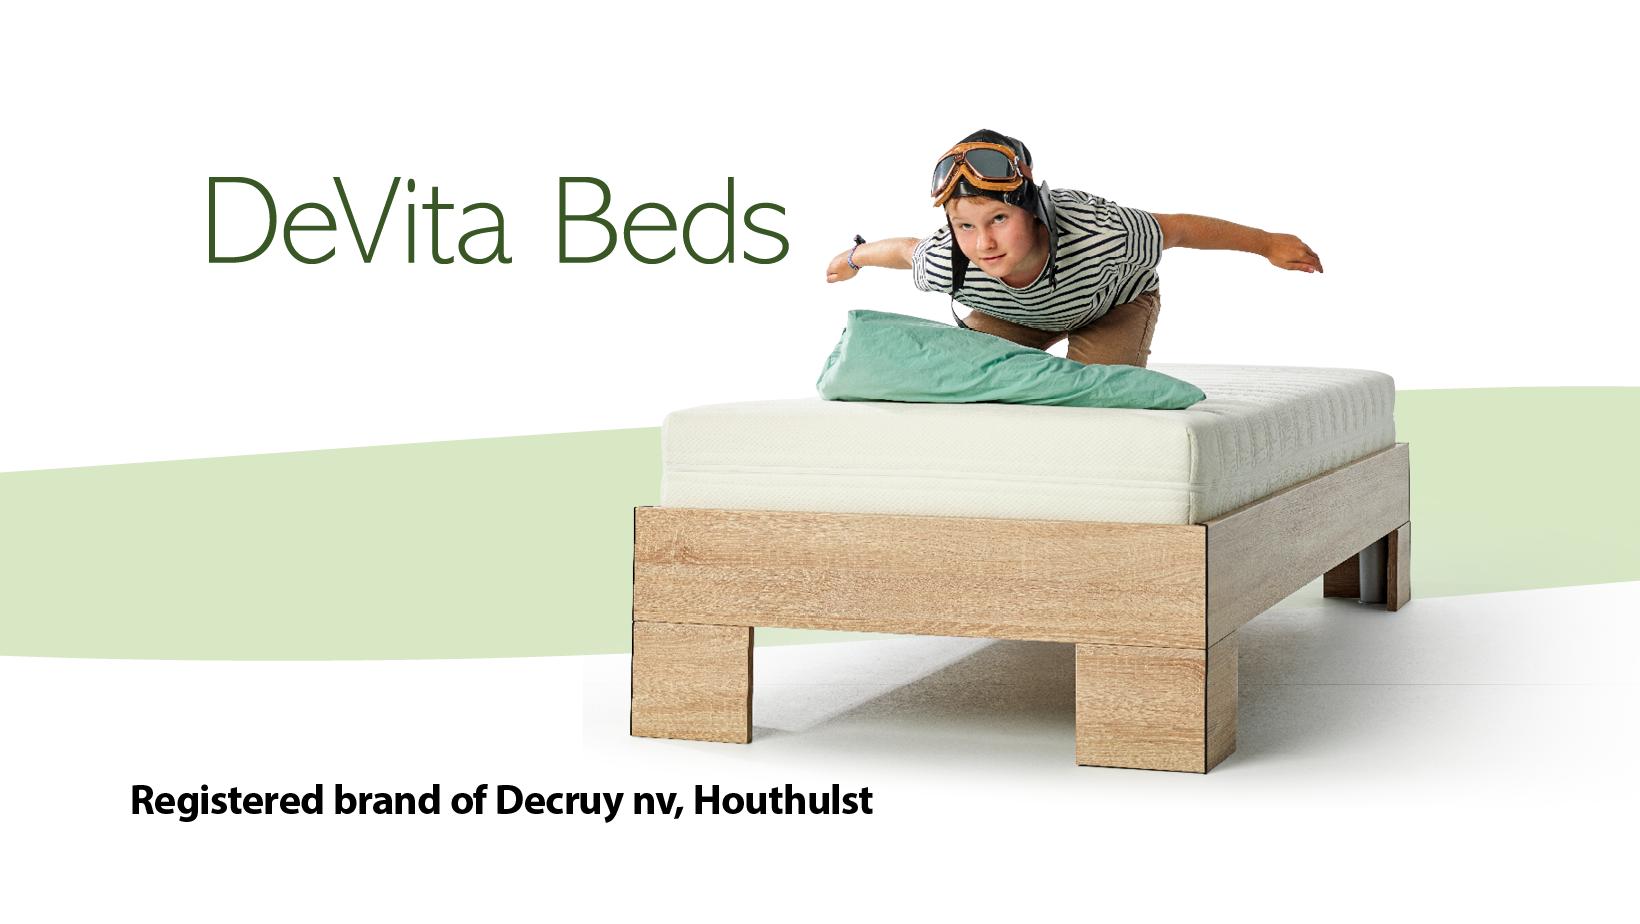 devita beds